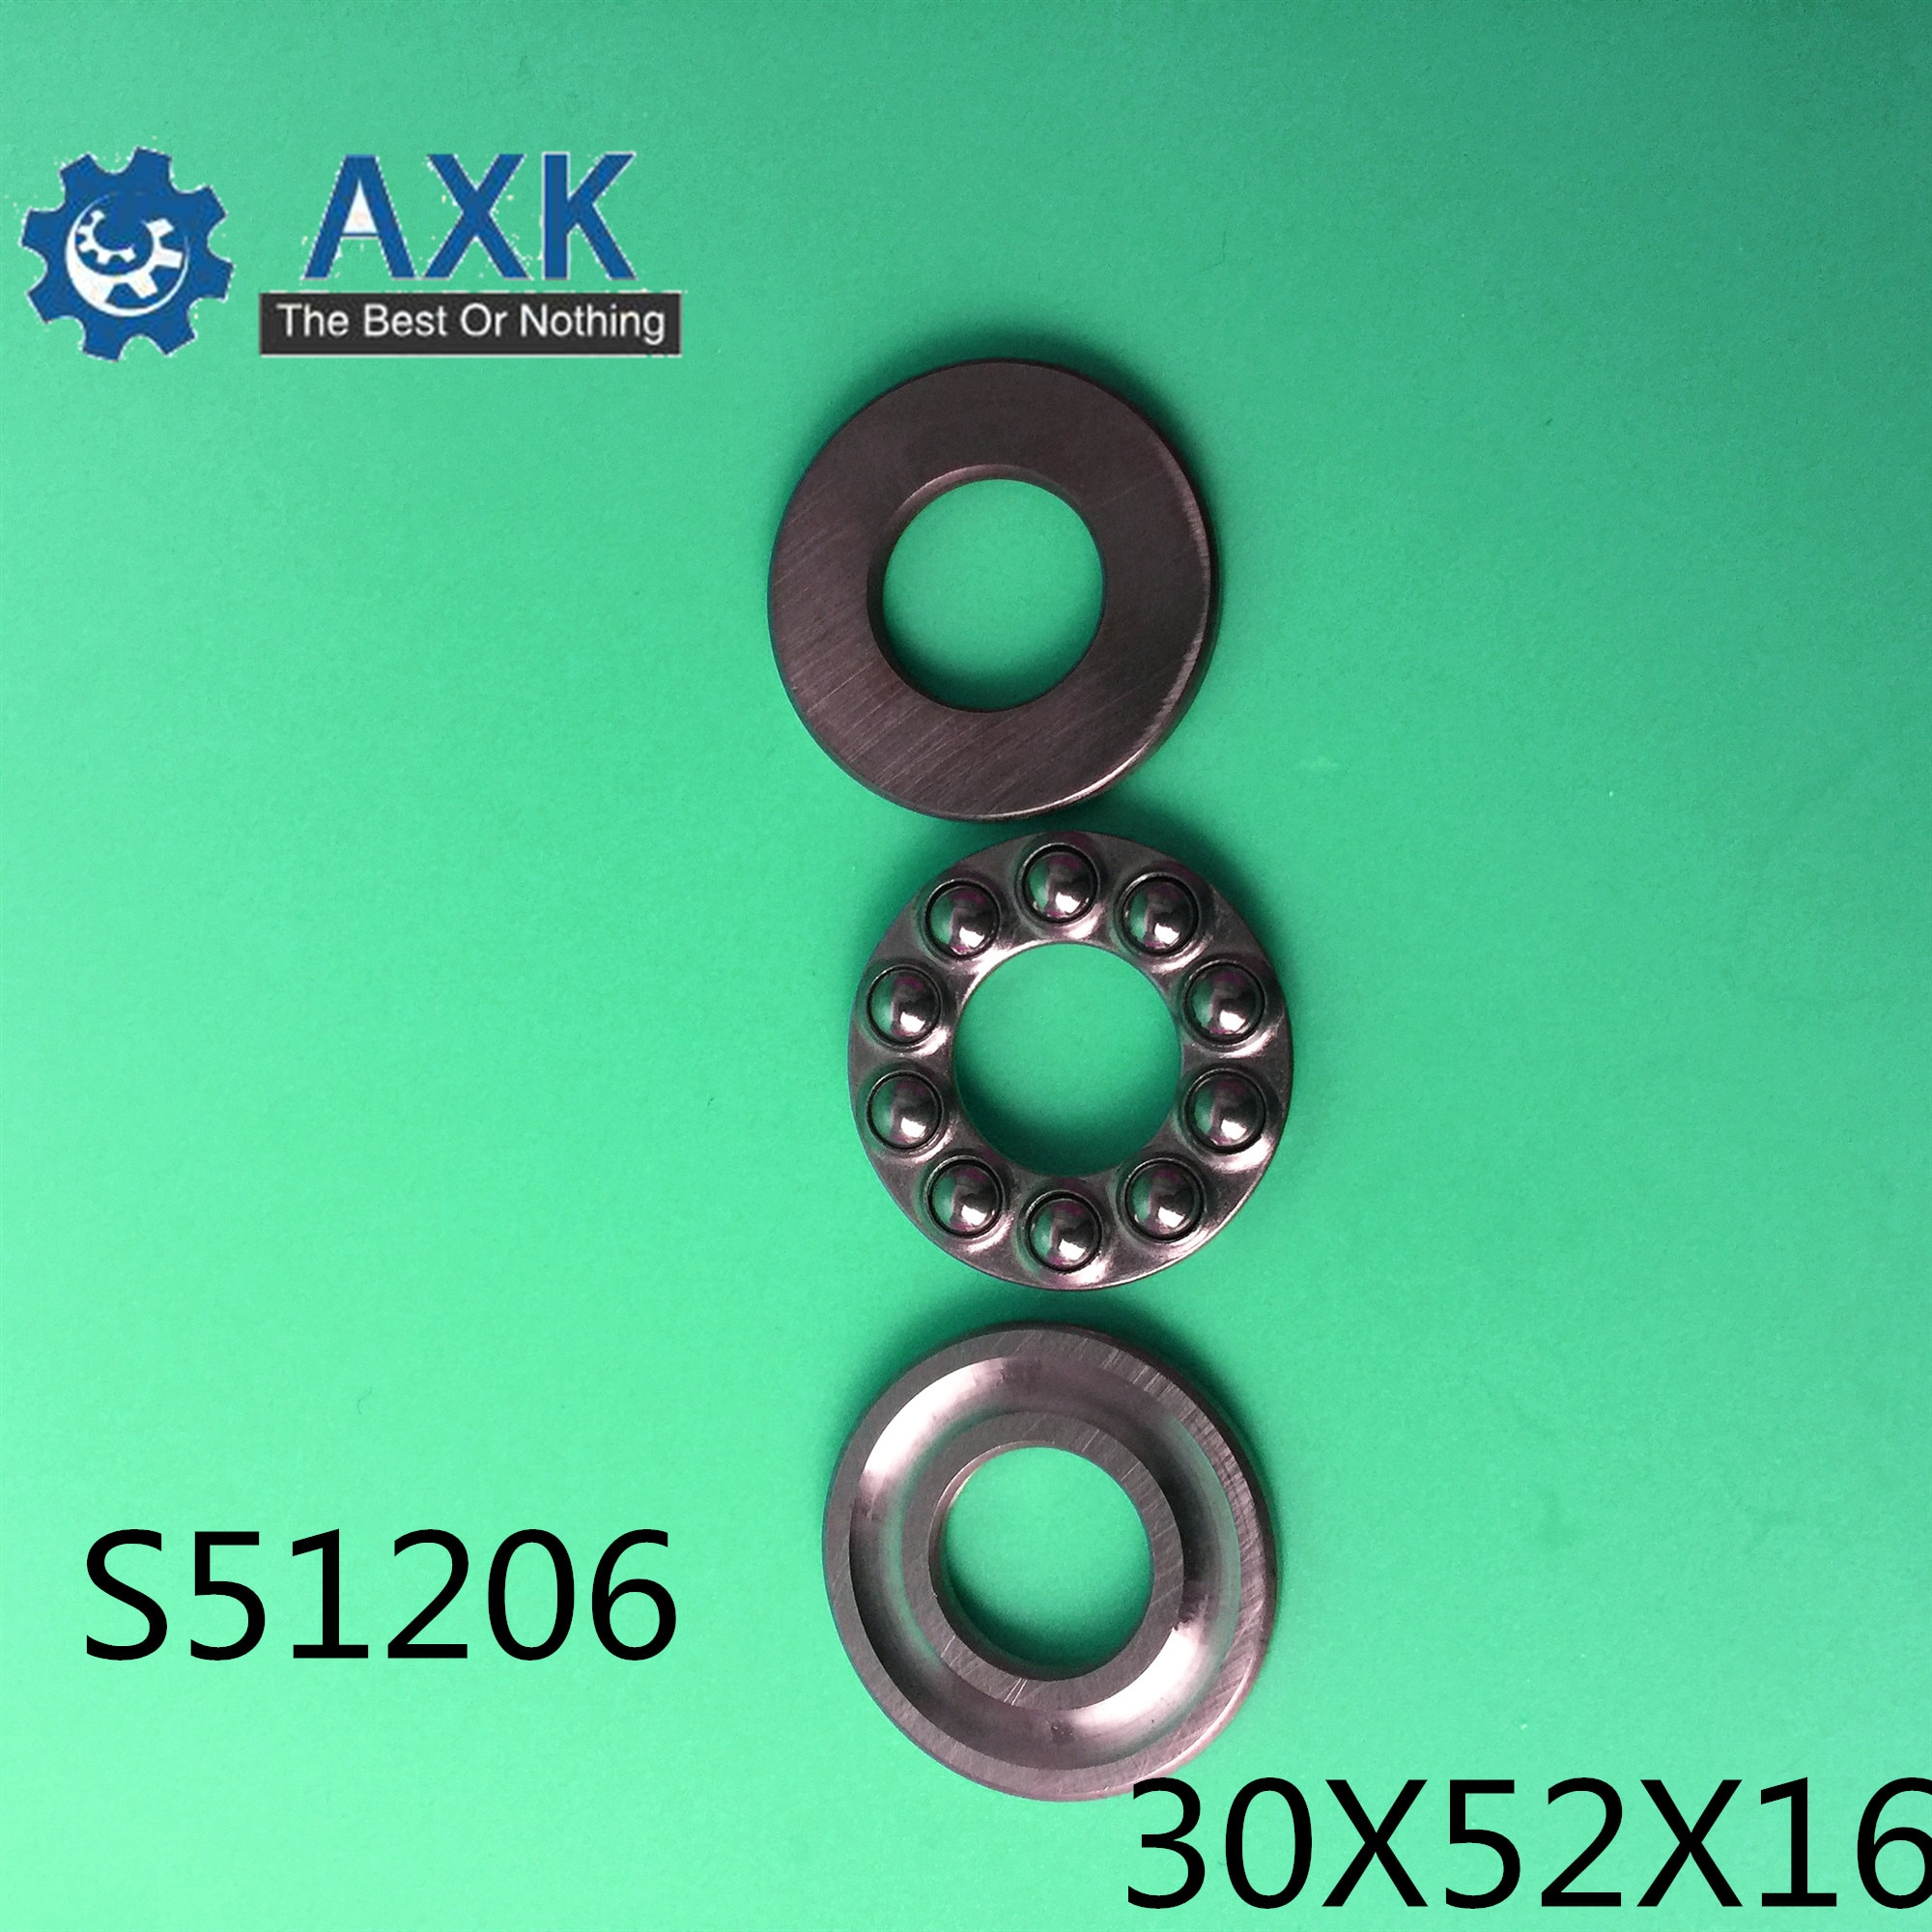 2pcs set stainless steel ball bearing smr105 2os cb abec 7 ld 5 10 4mm S51206 Bearing 30*52*16 mm ( 2PCS ) ABEC-1 Stainless Steel Thrust S 51206 Ball Bearings